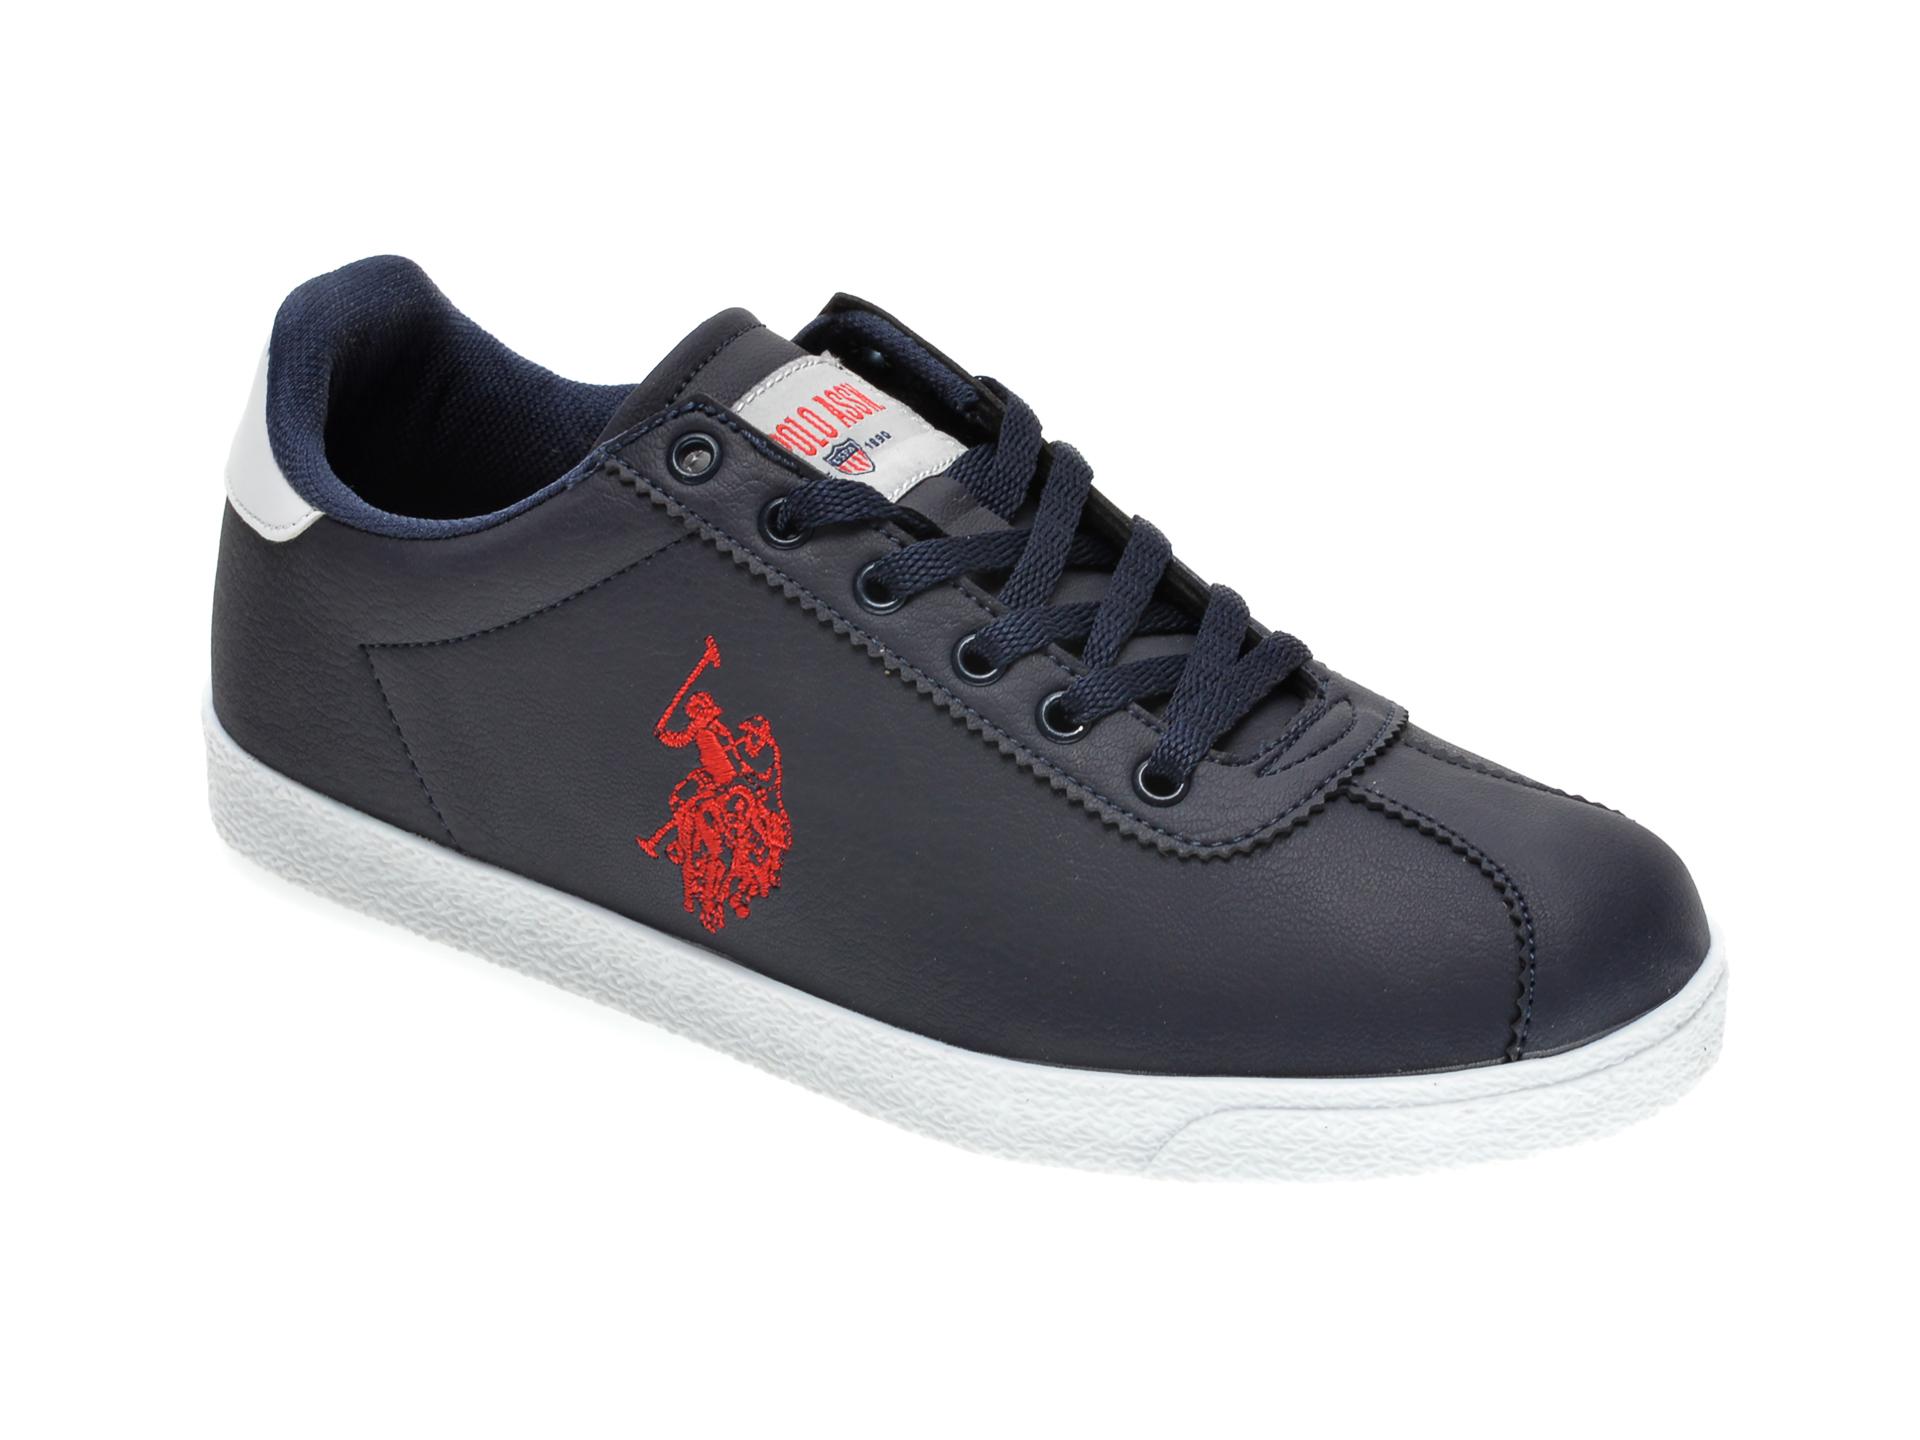 Pantofi sport US POLO ASSN bleumarin, 422466, din piele ecologica New